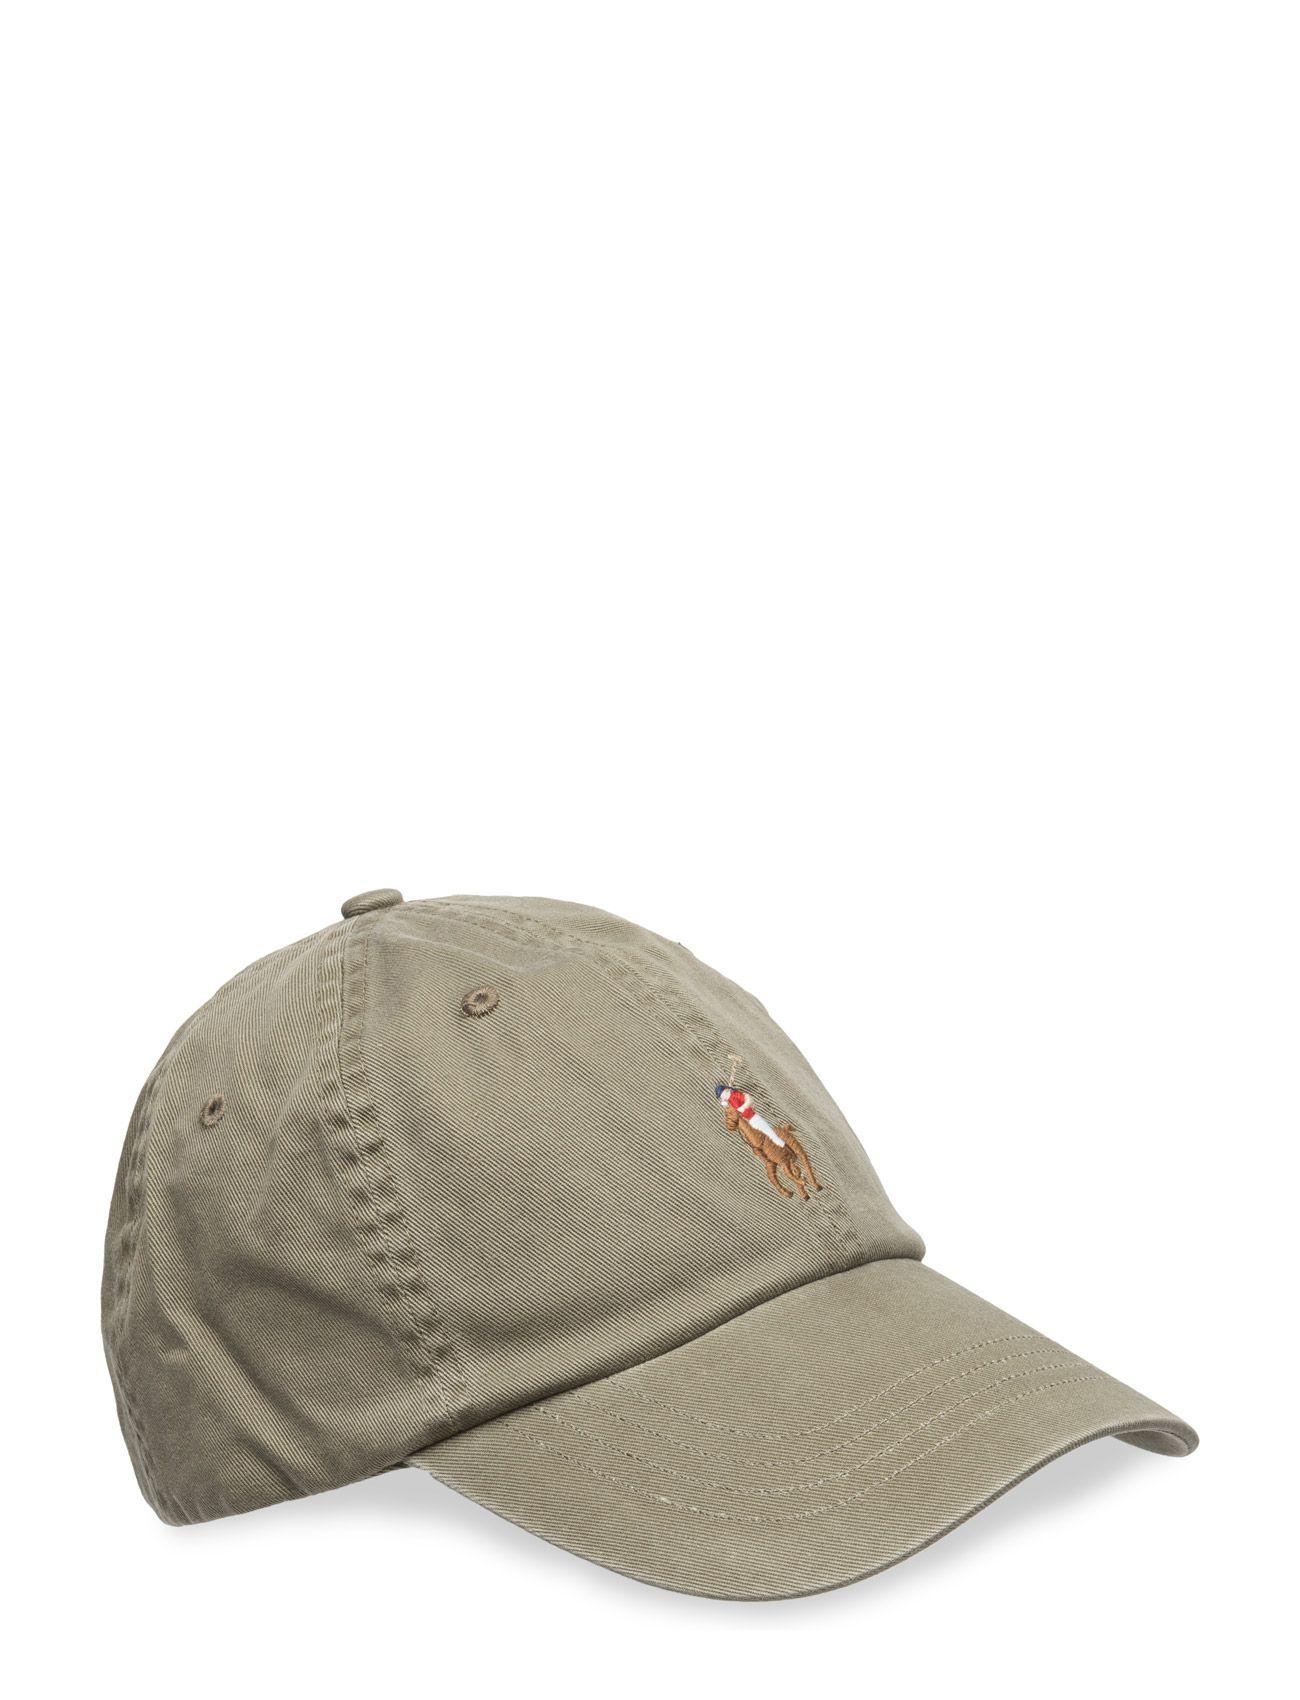 218aadfb85f5 polo ralph lauren classic sport cap w  small pp mill olive men accessories    bags hats caps  8dUhwKKp-ltoZyFs0